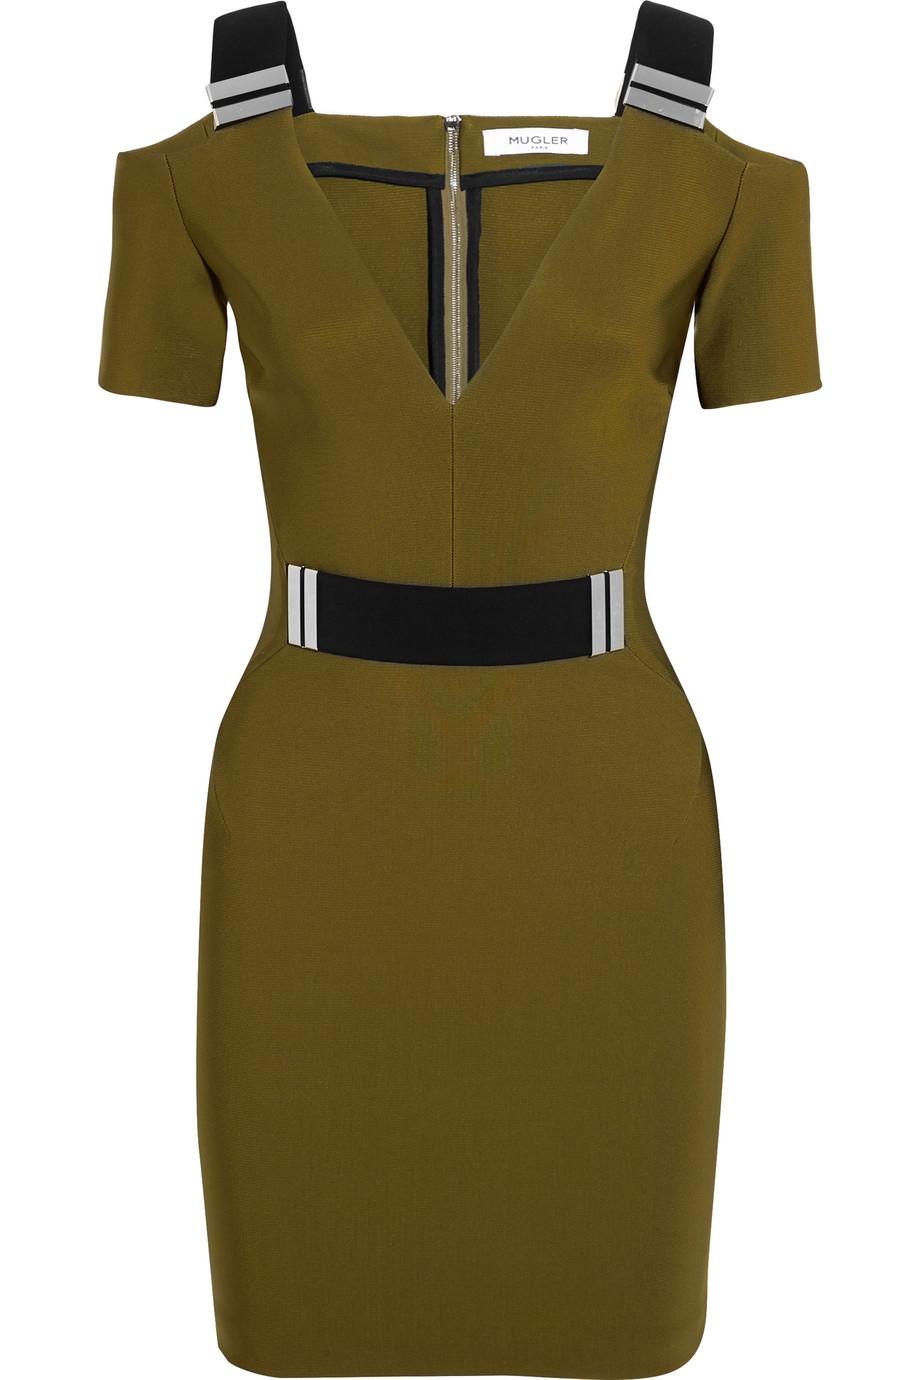 Mugler Cutout Embellished Stretch-Crepe Mini Dress, Army Green, Women's, Size: 36